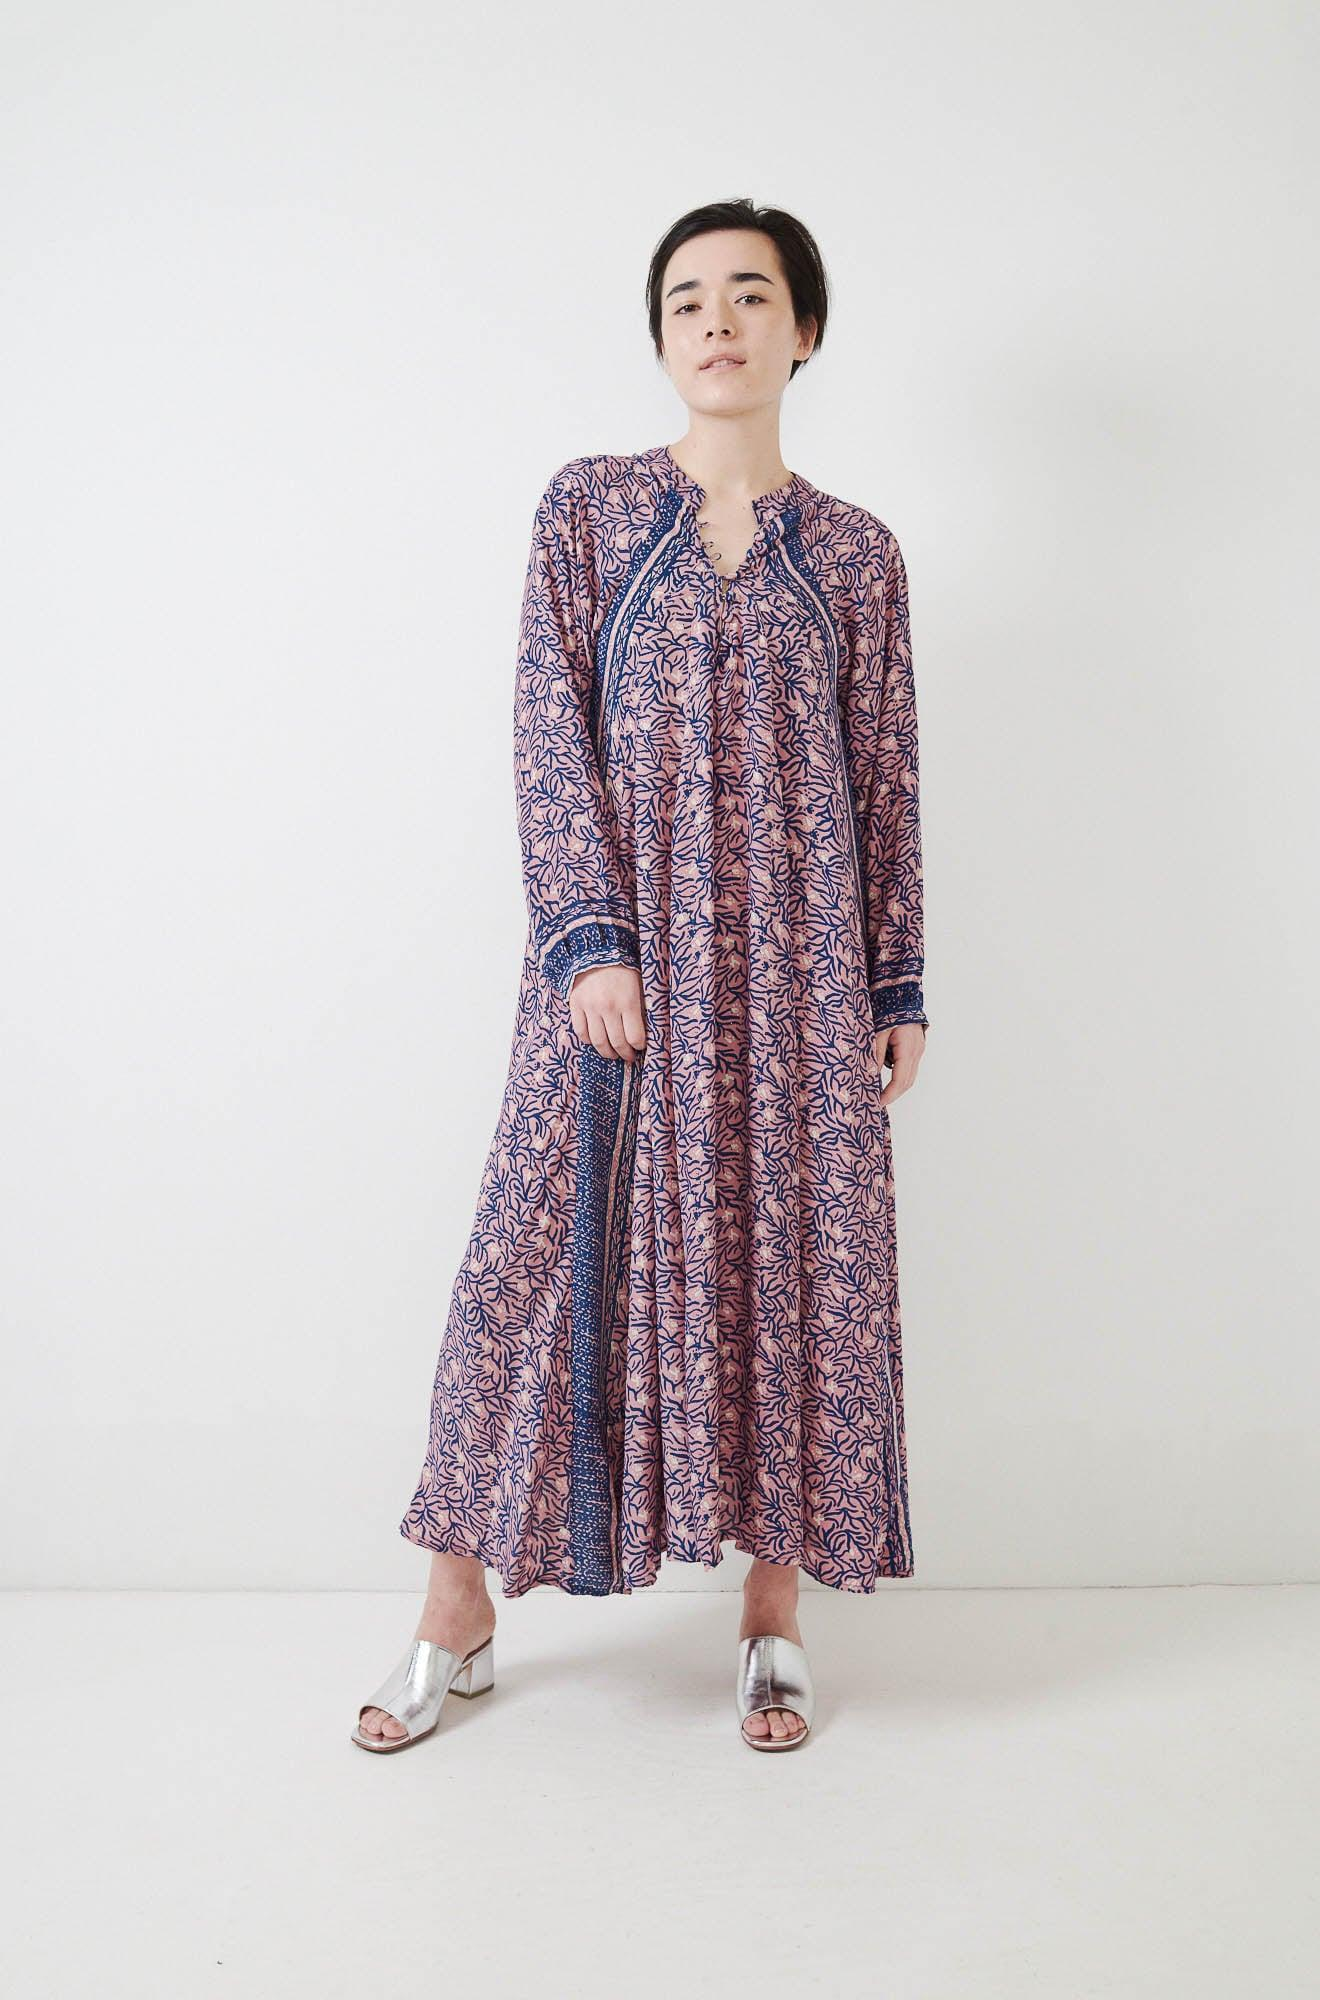 726e39ba82d Lyst - Natalie Martin Fiore Maxi Dress in Purple